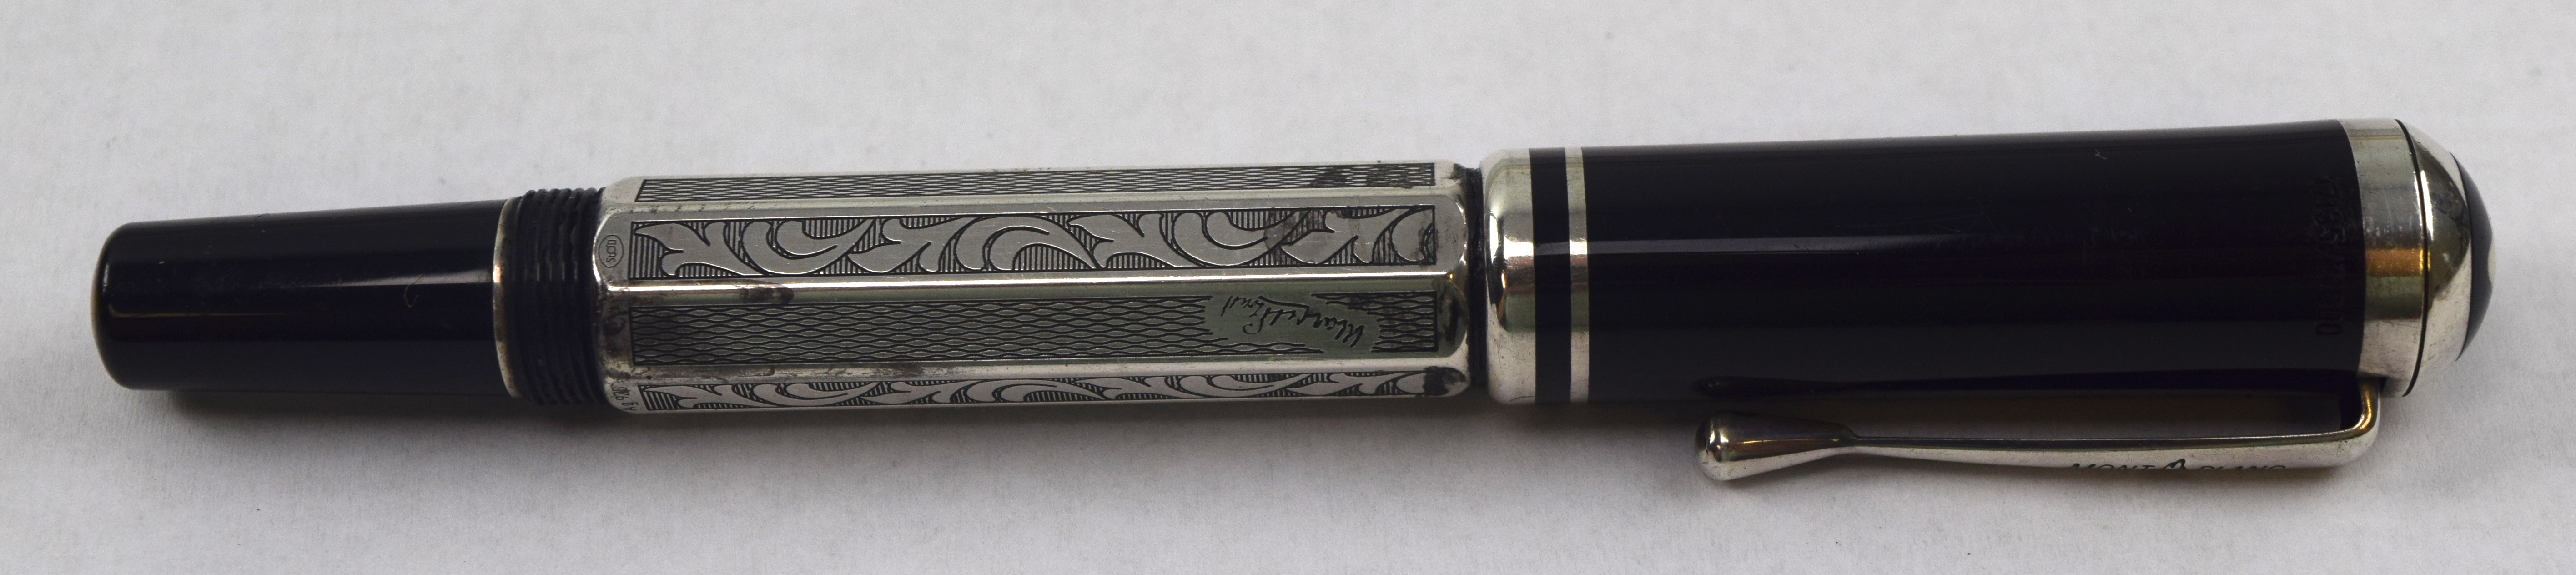 Montblanc Meisterstuck Pen